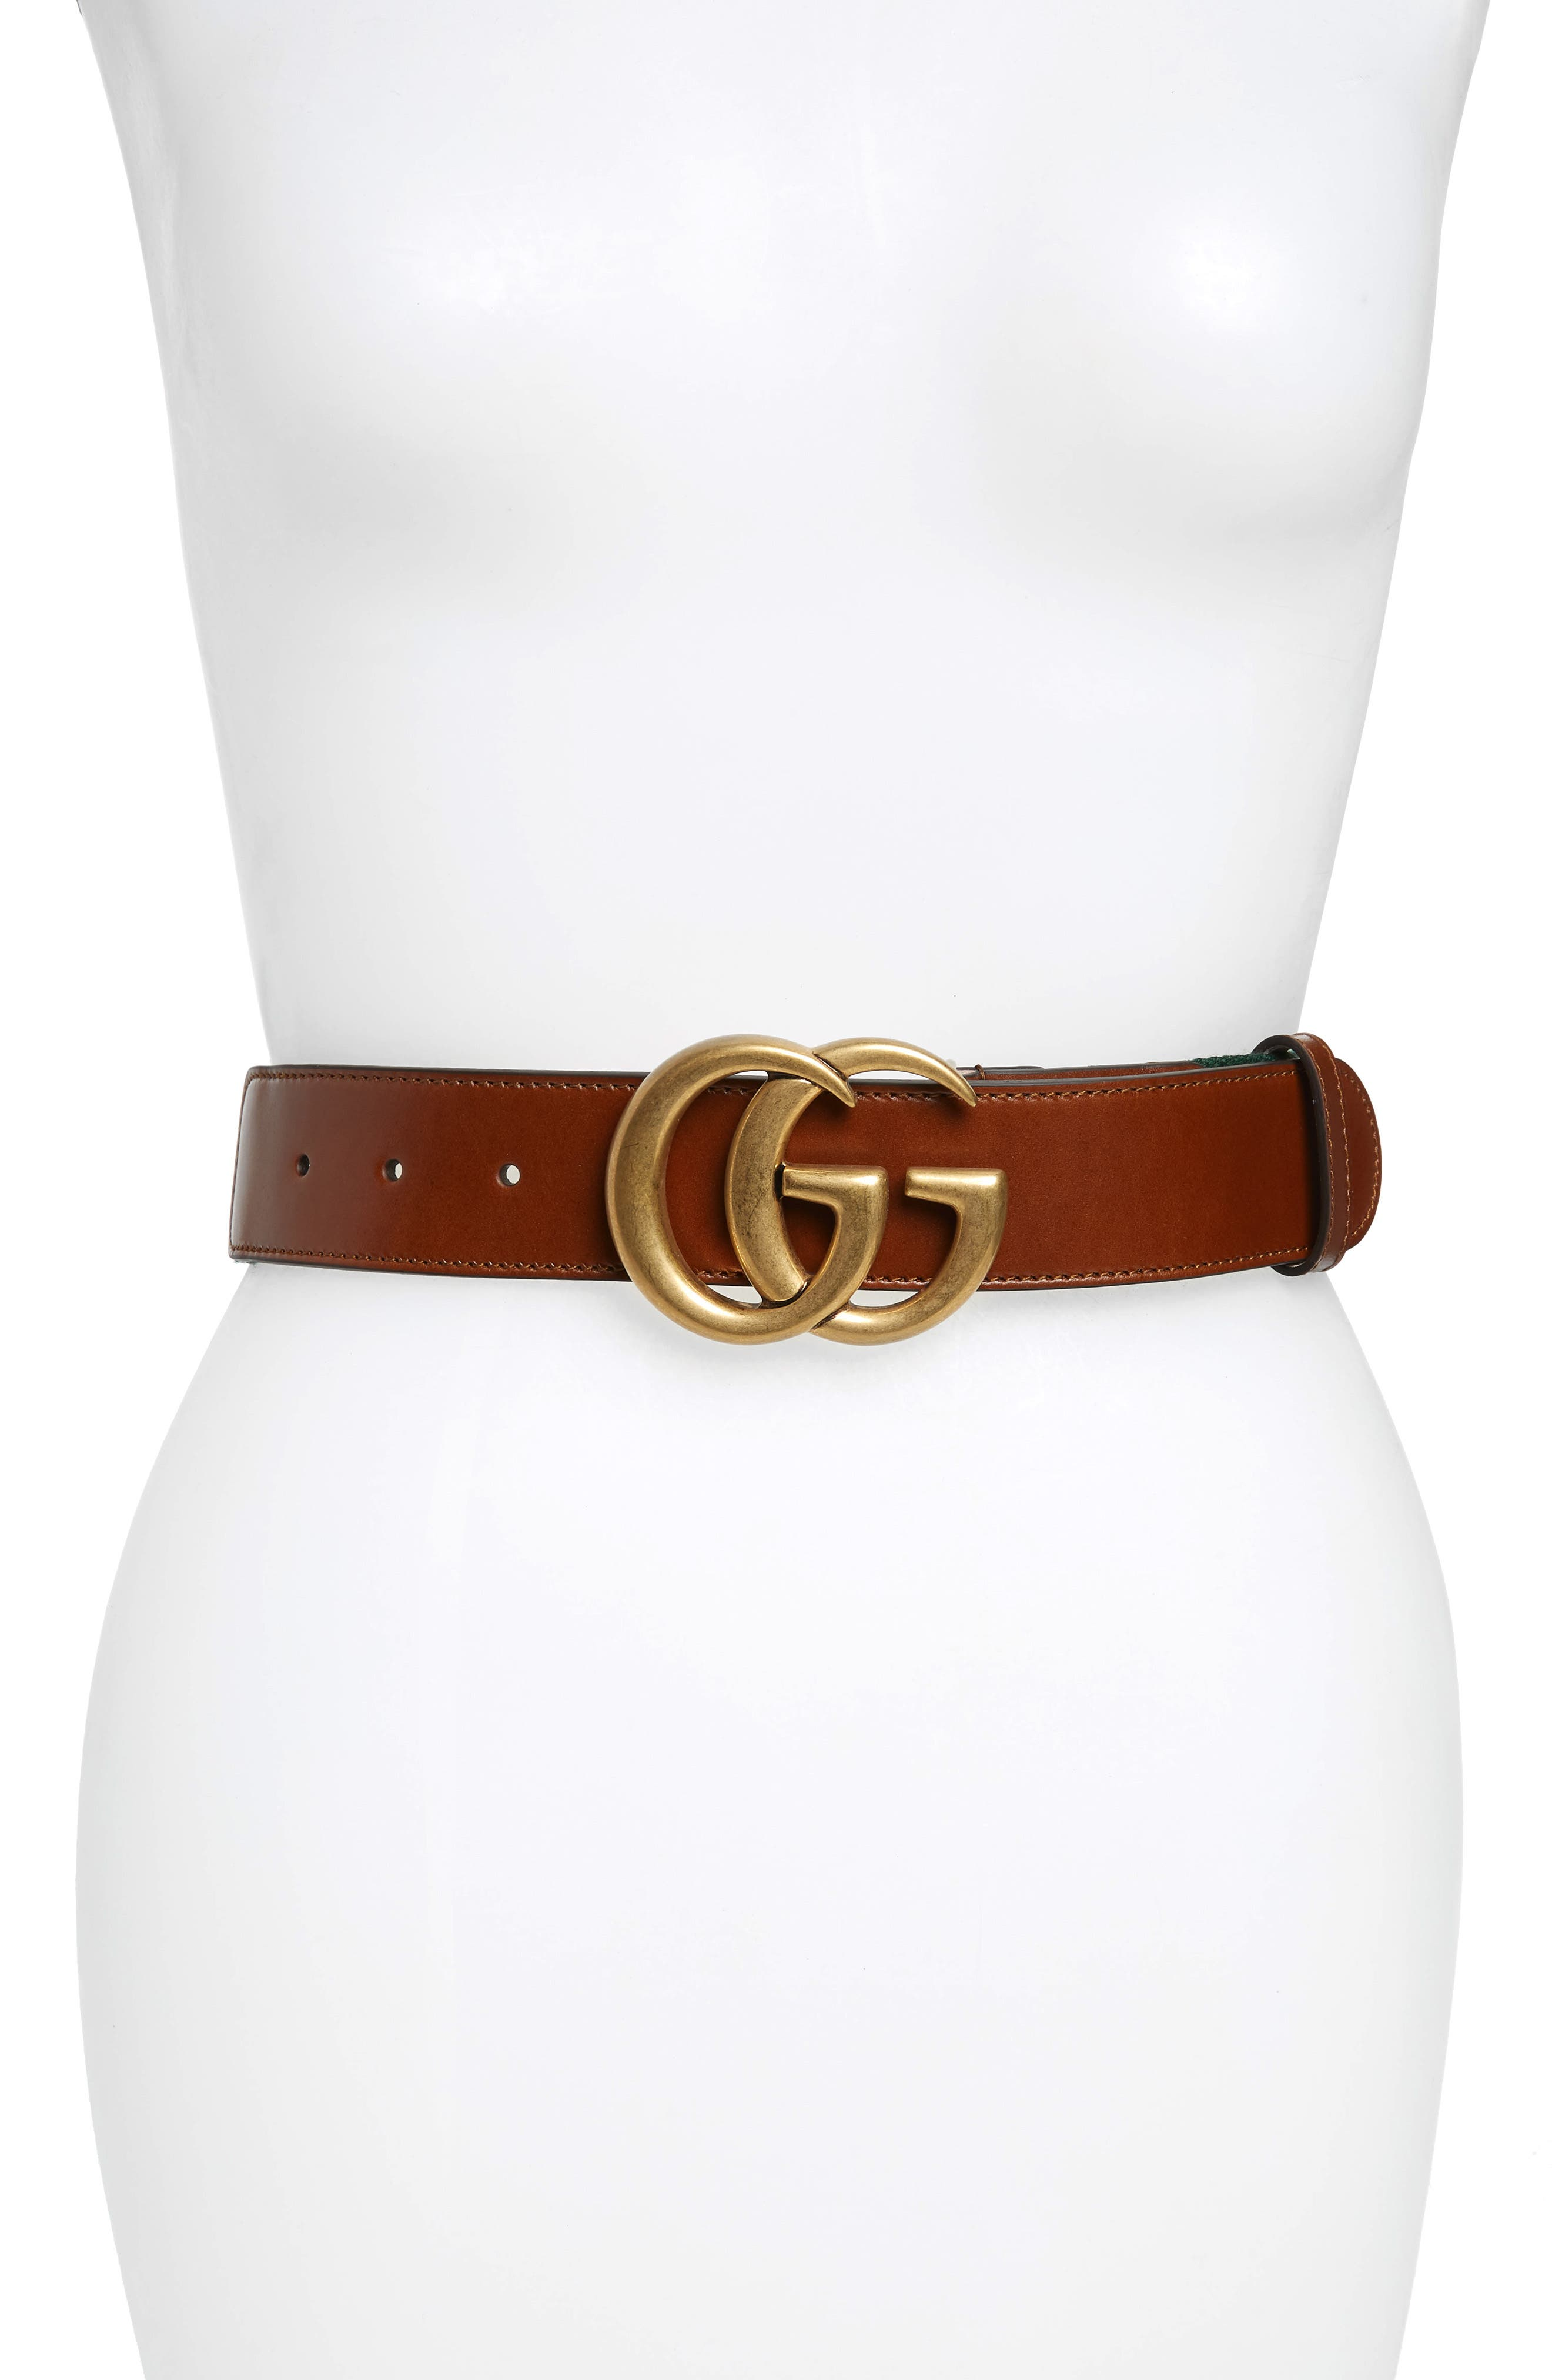 GUCCI GG Logo Leather Belt, Main, color, CUIR/VRV